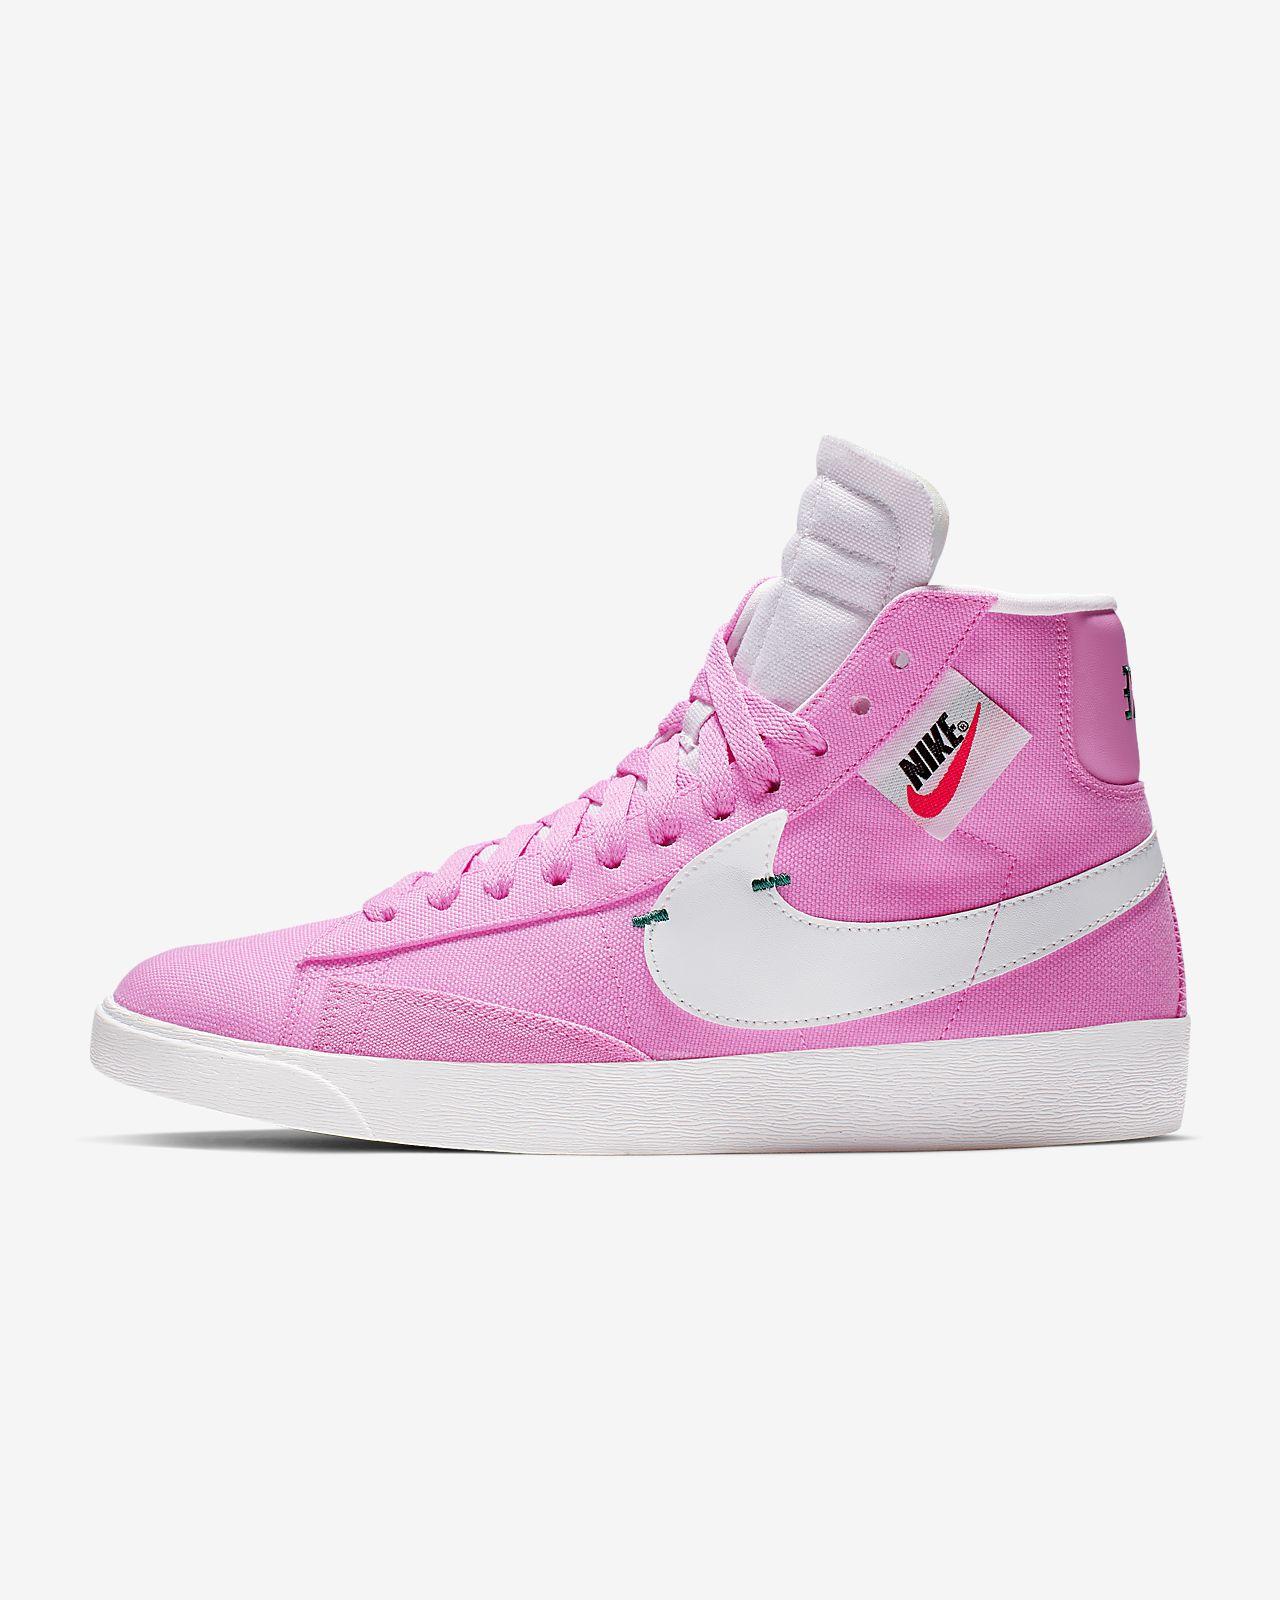 455efd05b Nike Blazer Mid Rebel Zapatillas - Mujer. Nike.com ES